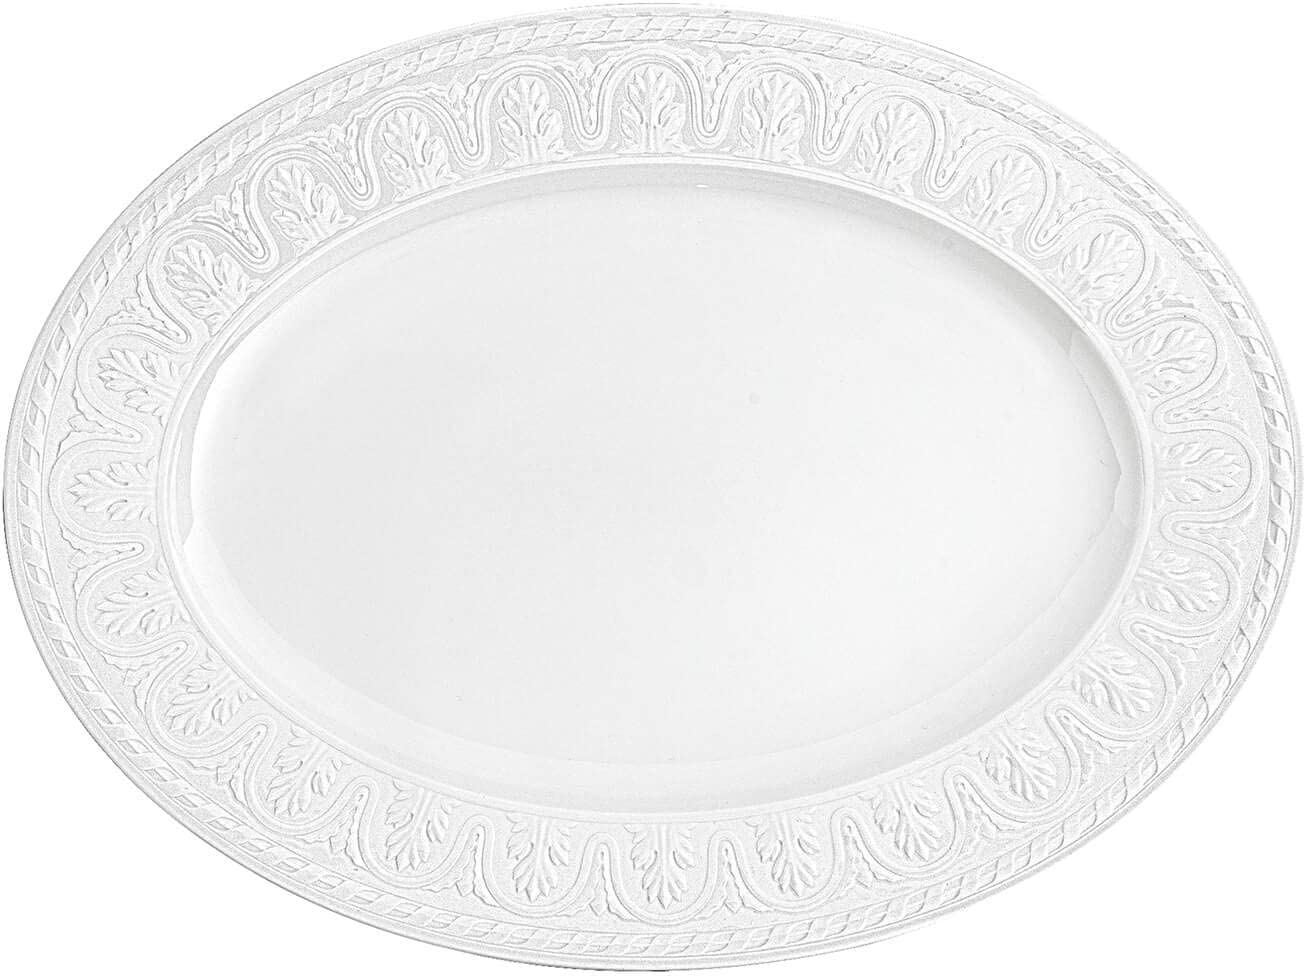 Cellini Oval Serving Platter by Villeroy Charlotte Mall Boch Porcel 5 ☆ very popular - Premium